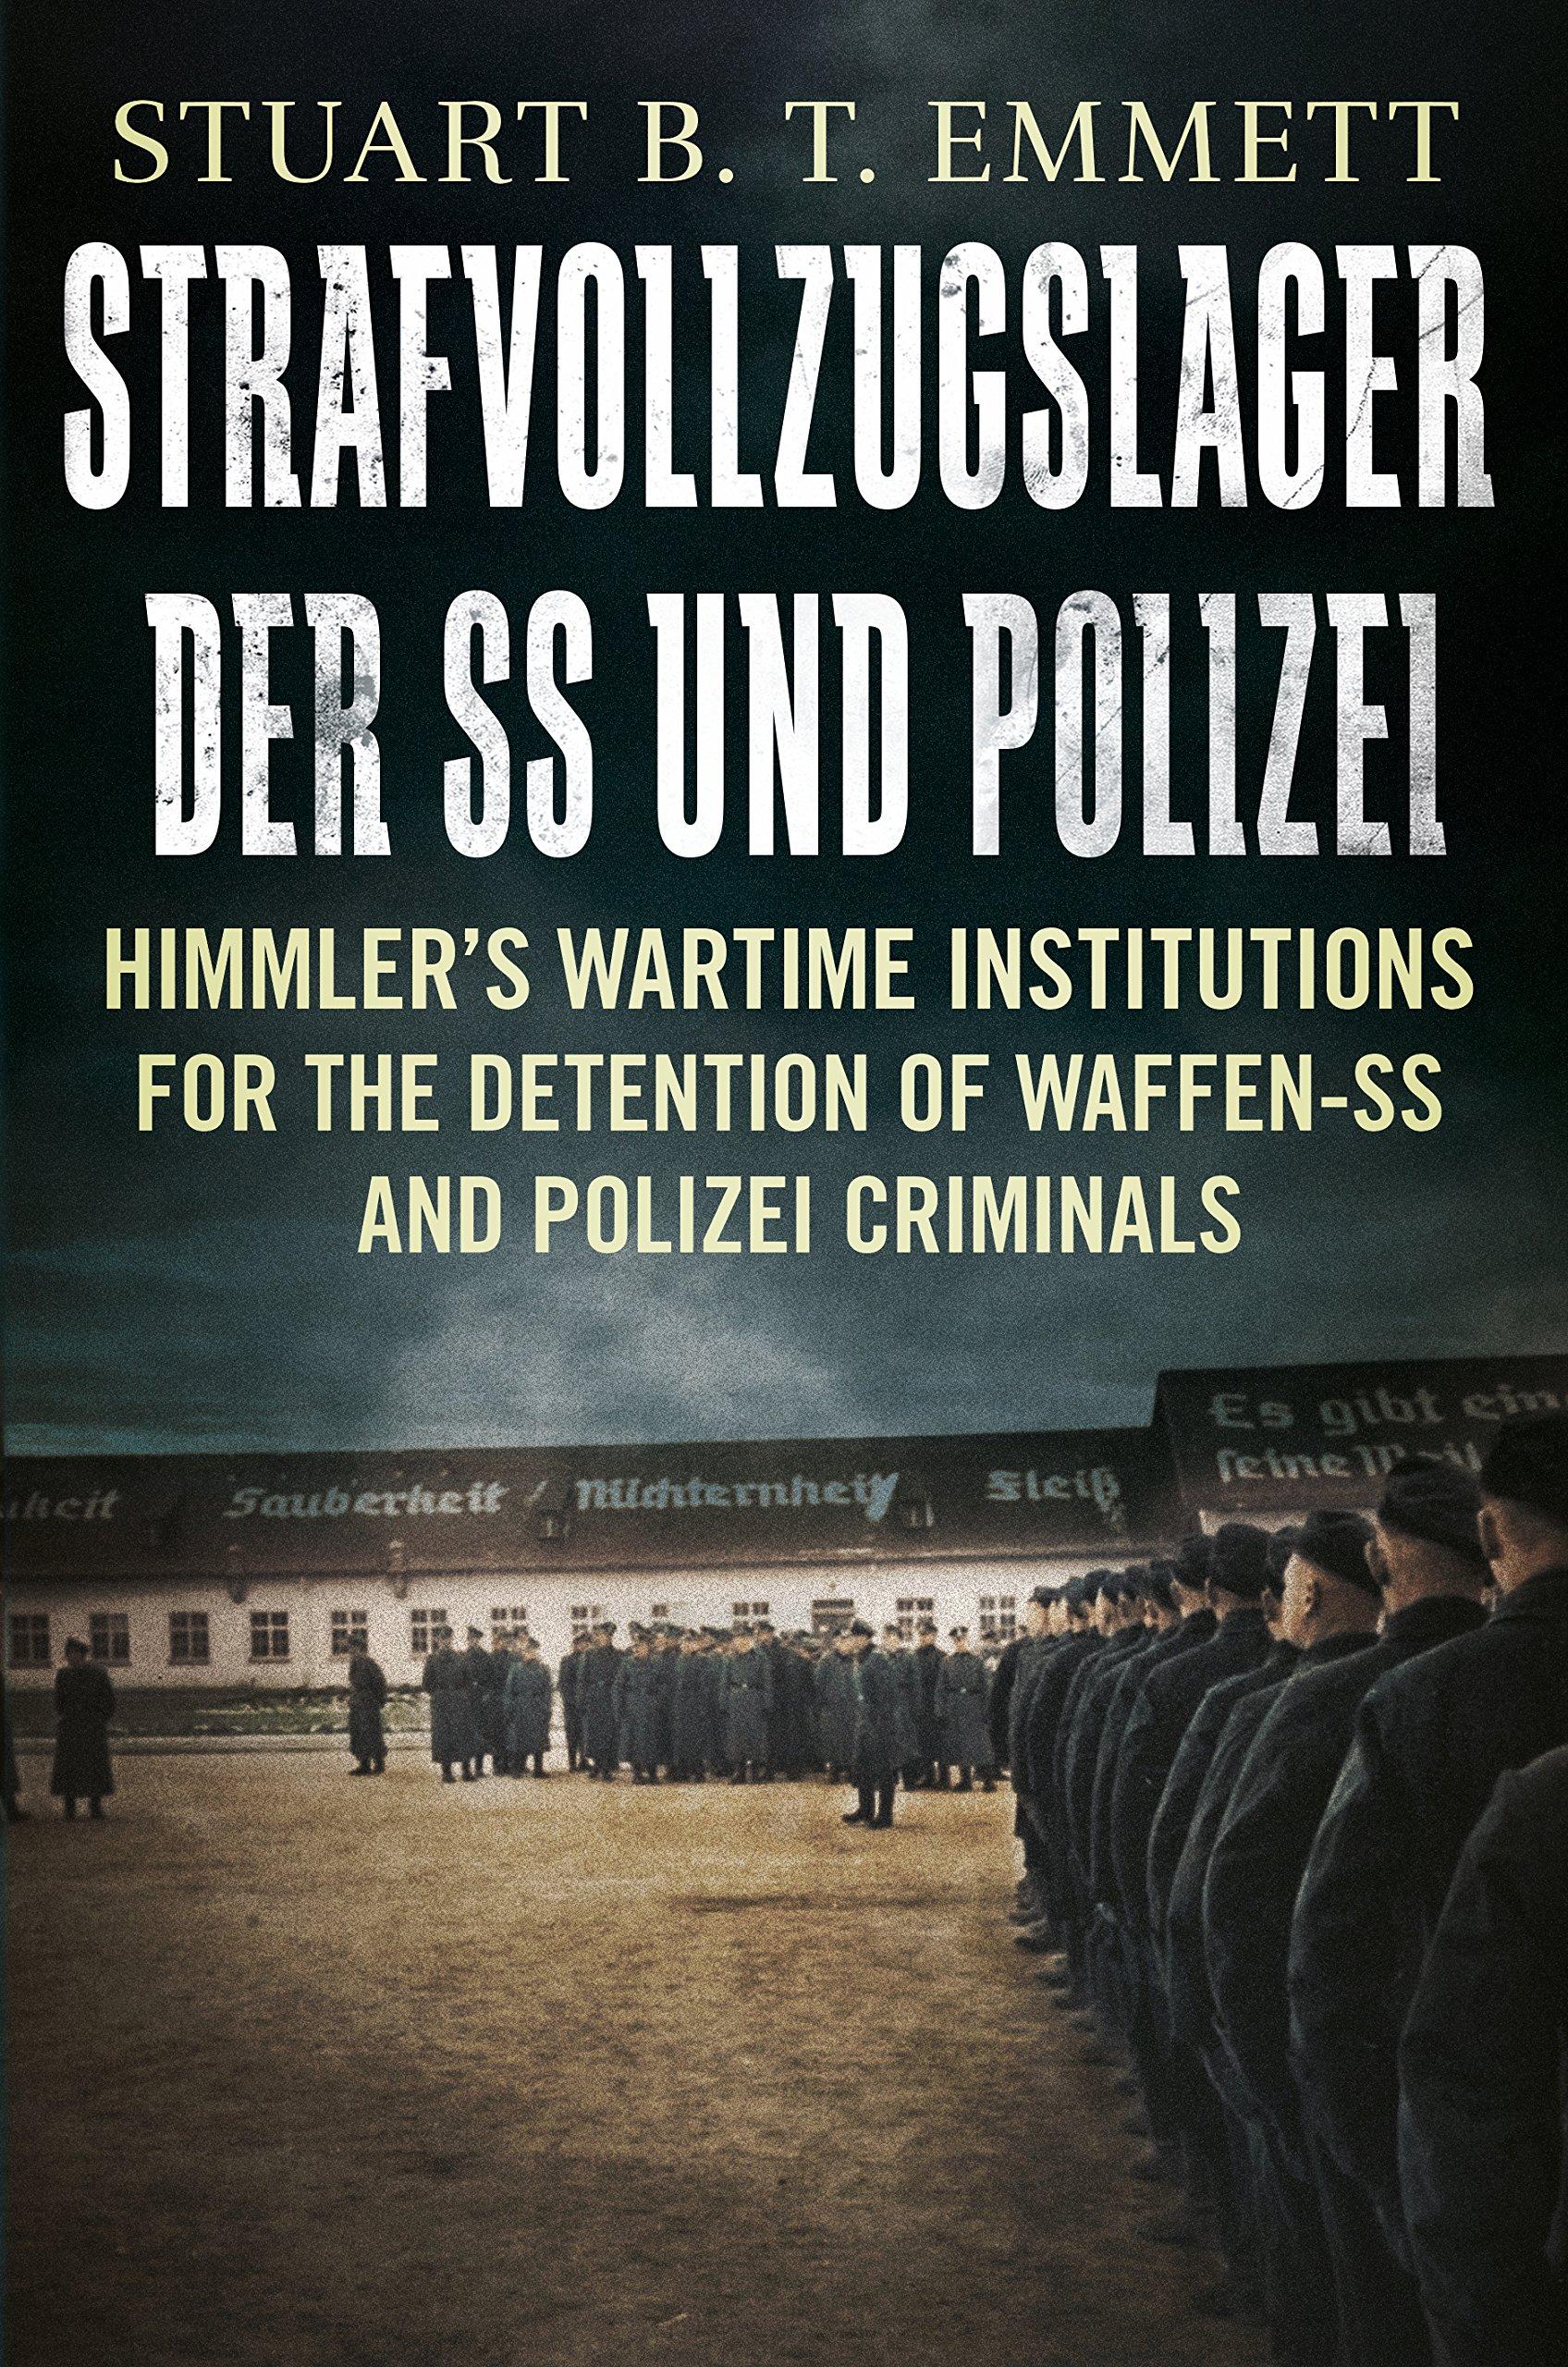 Strafvollzugslager der SS und Polizei: Himmler'S Wartime Institutions for  the Detention of Waffen-Ss and Polize: Amazon.de: Insight Guides:  Fremdsprachige ...